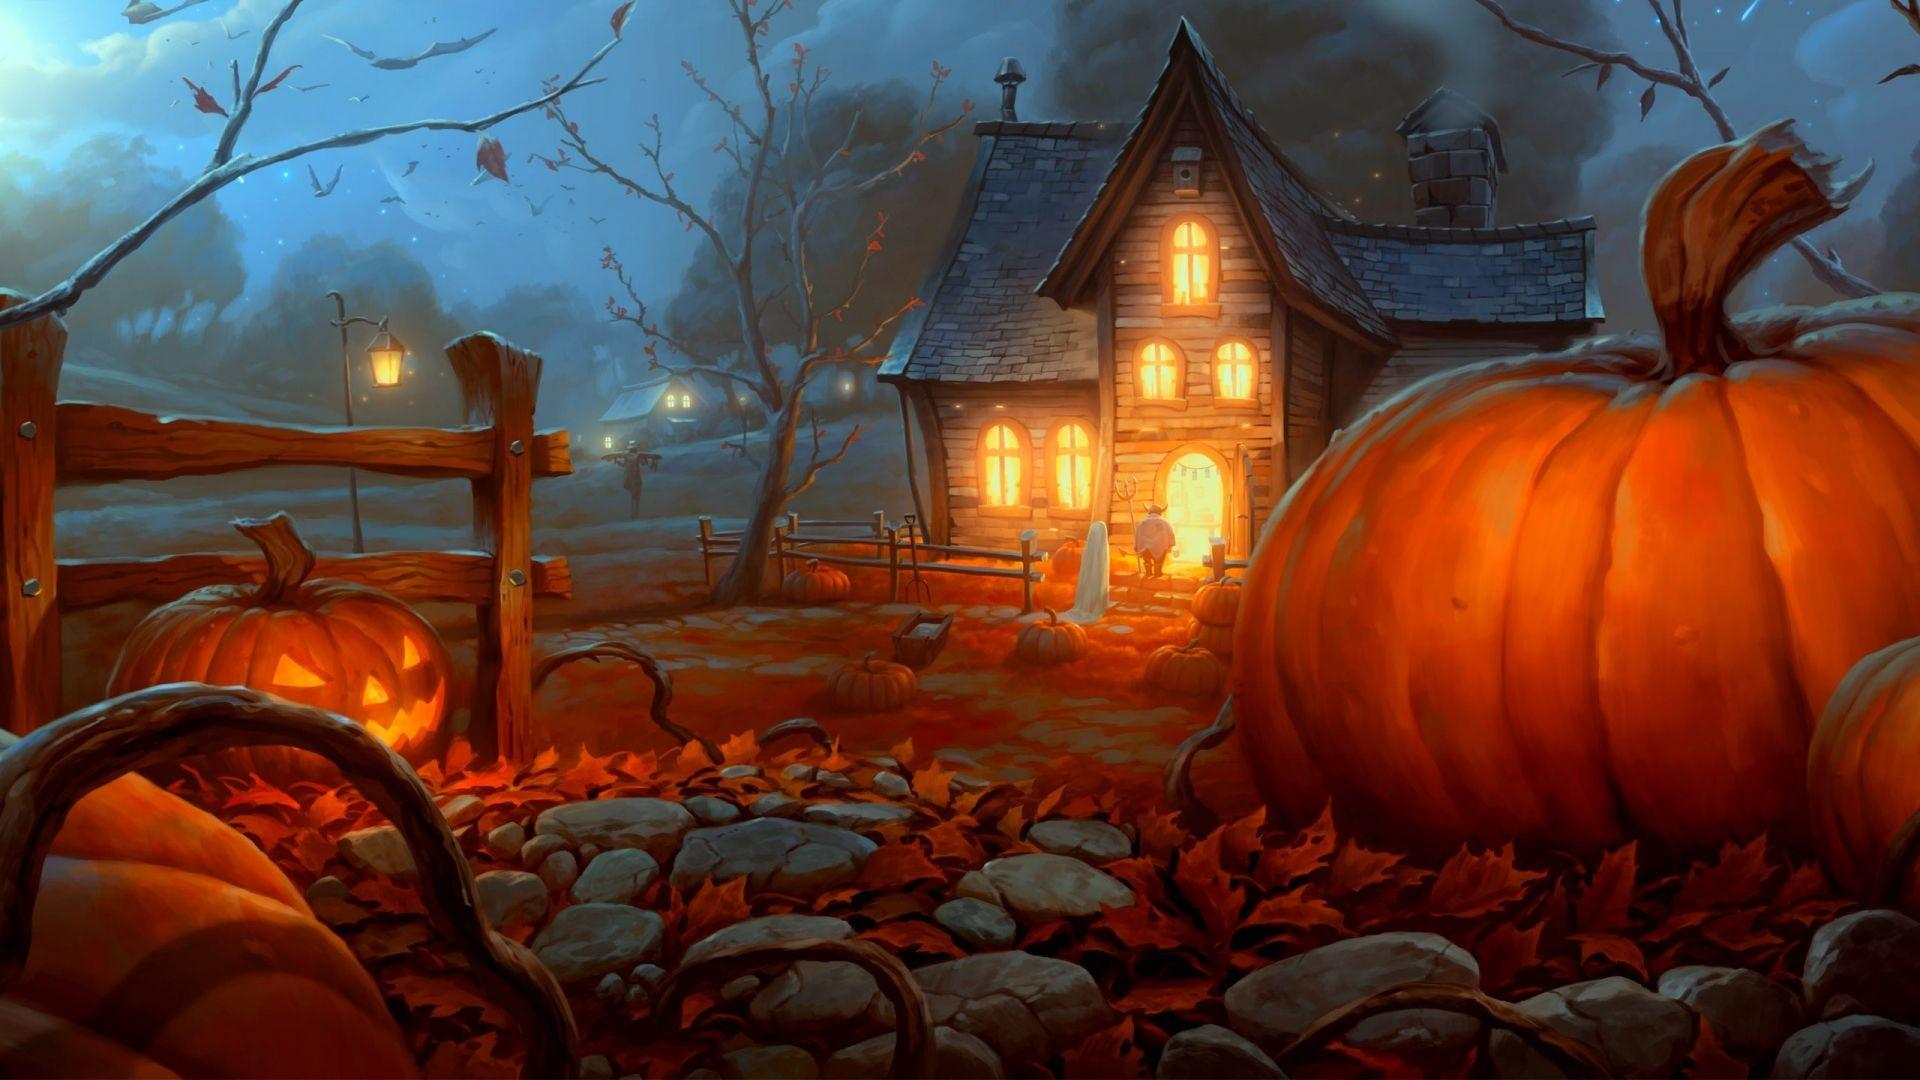 1920x1080 Hd Halloween Wallpaper 66 Images